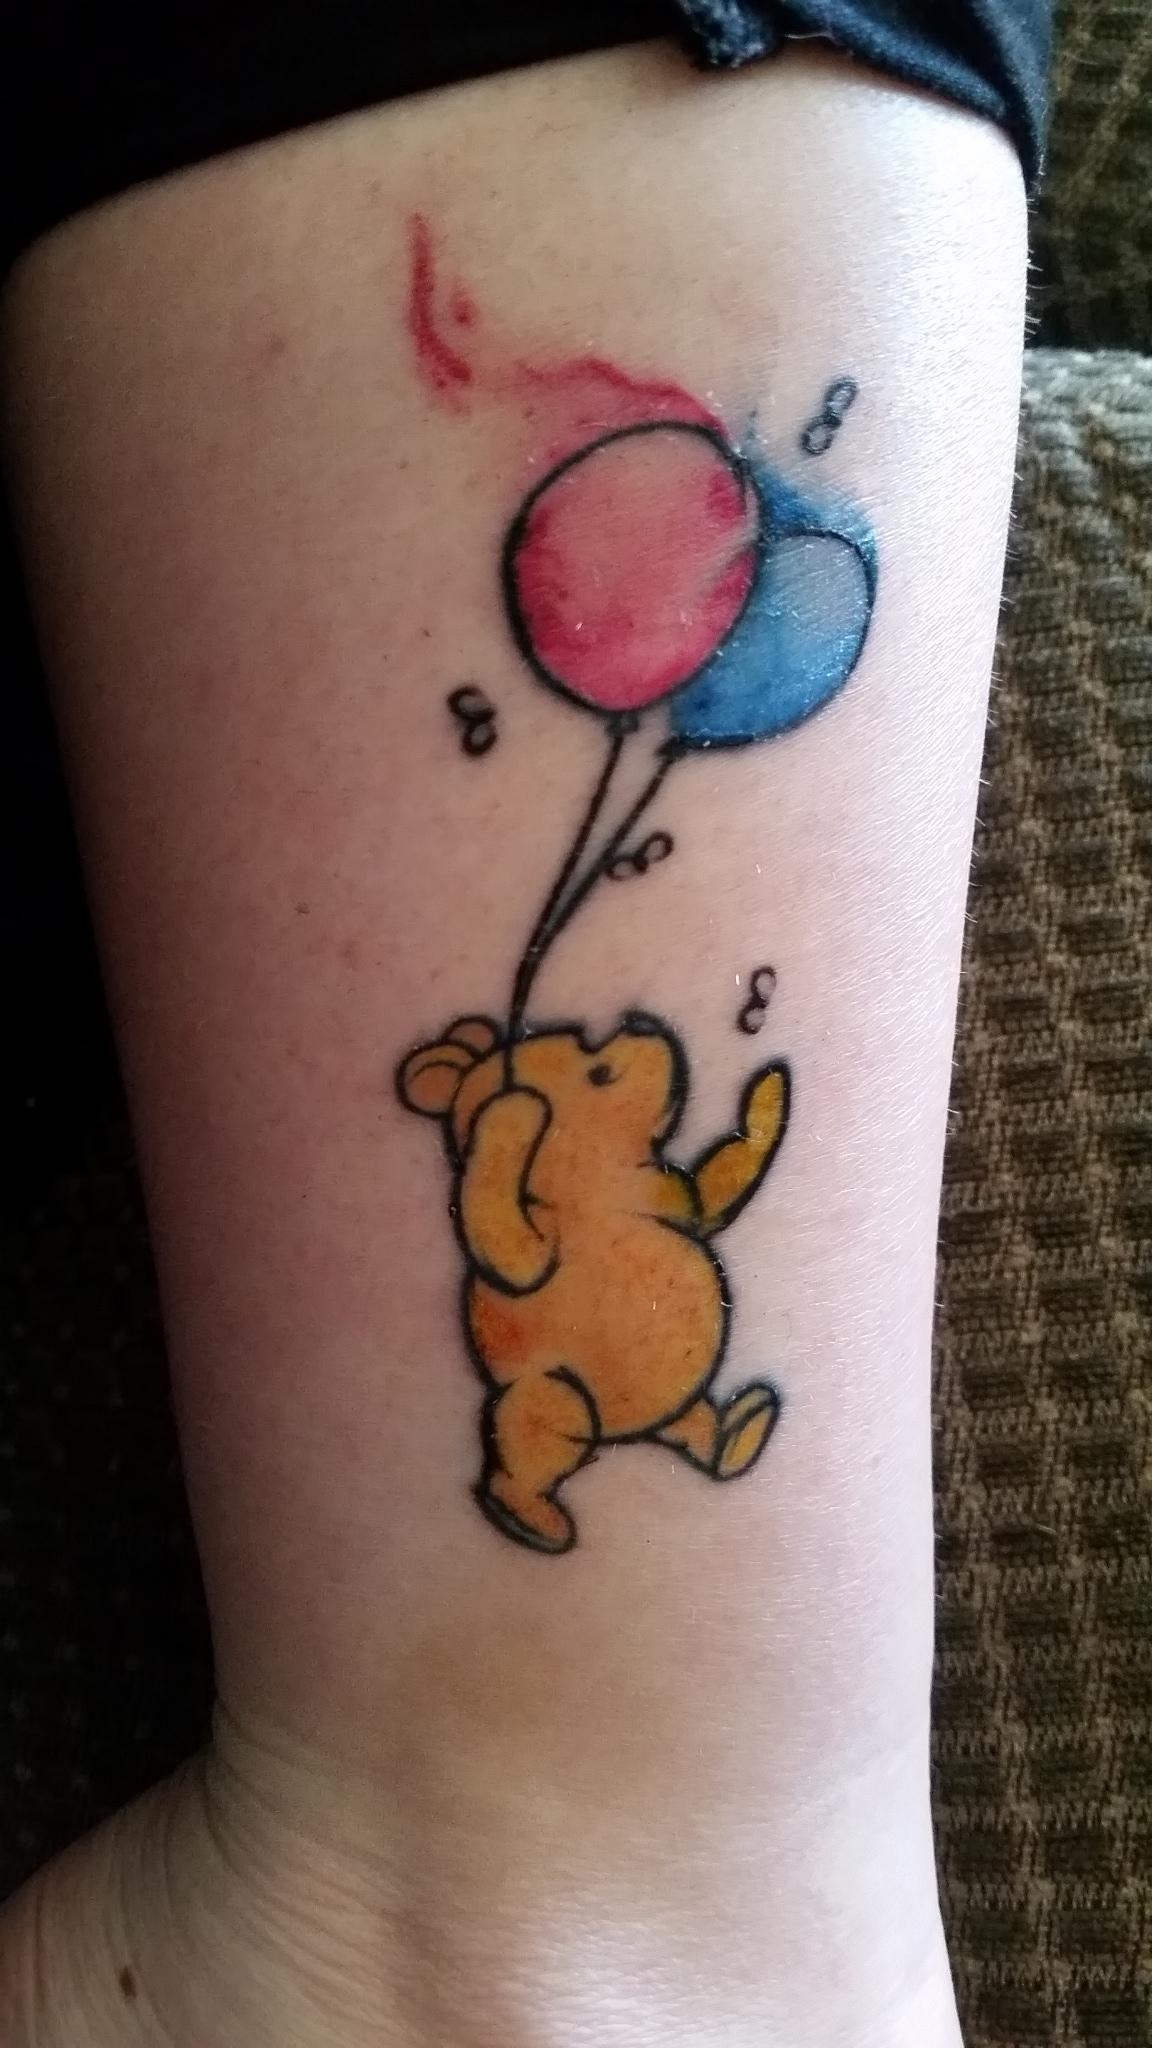 My first tattoo old school Winnie the Pooh. First